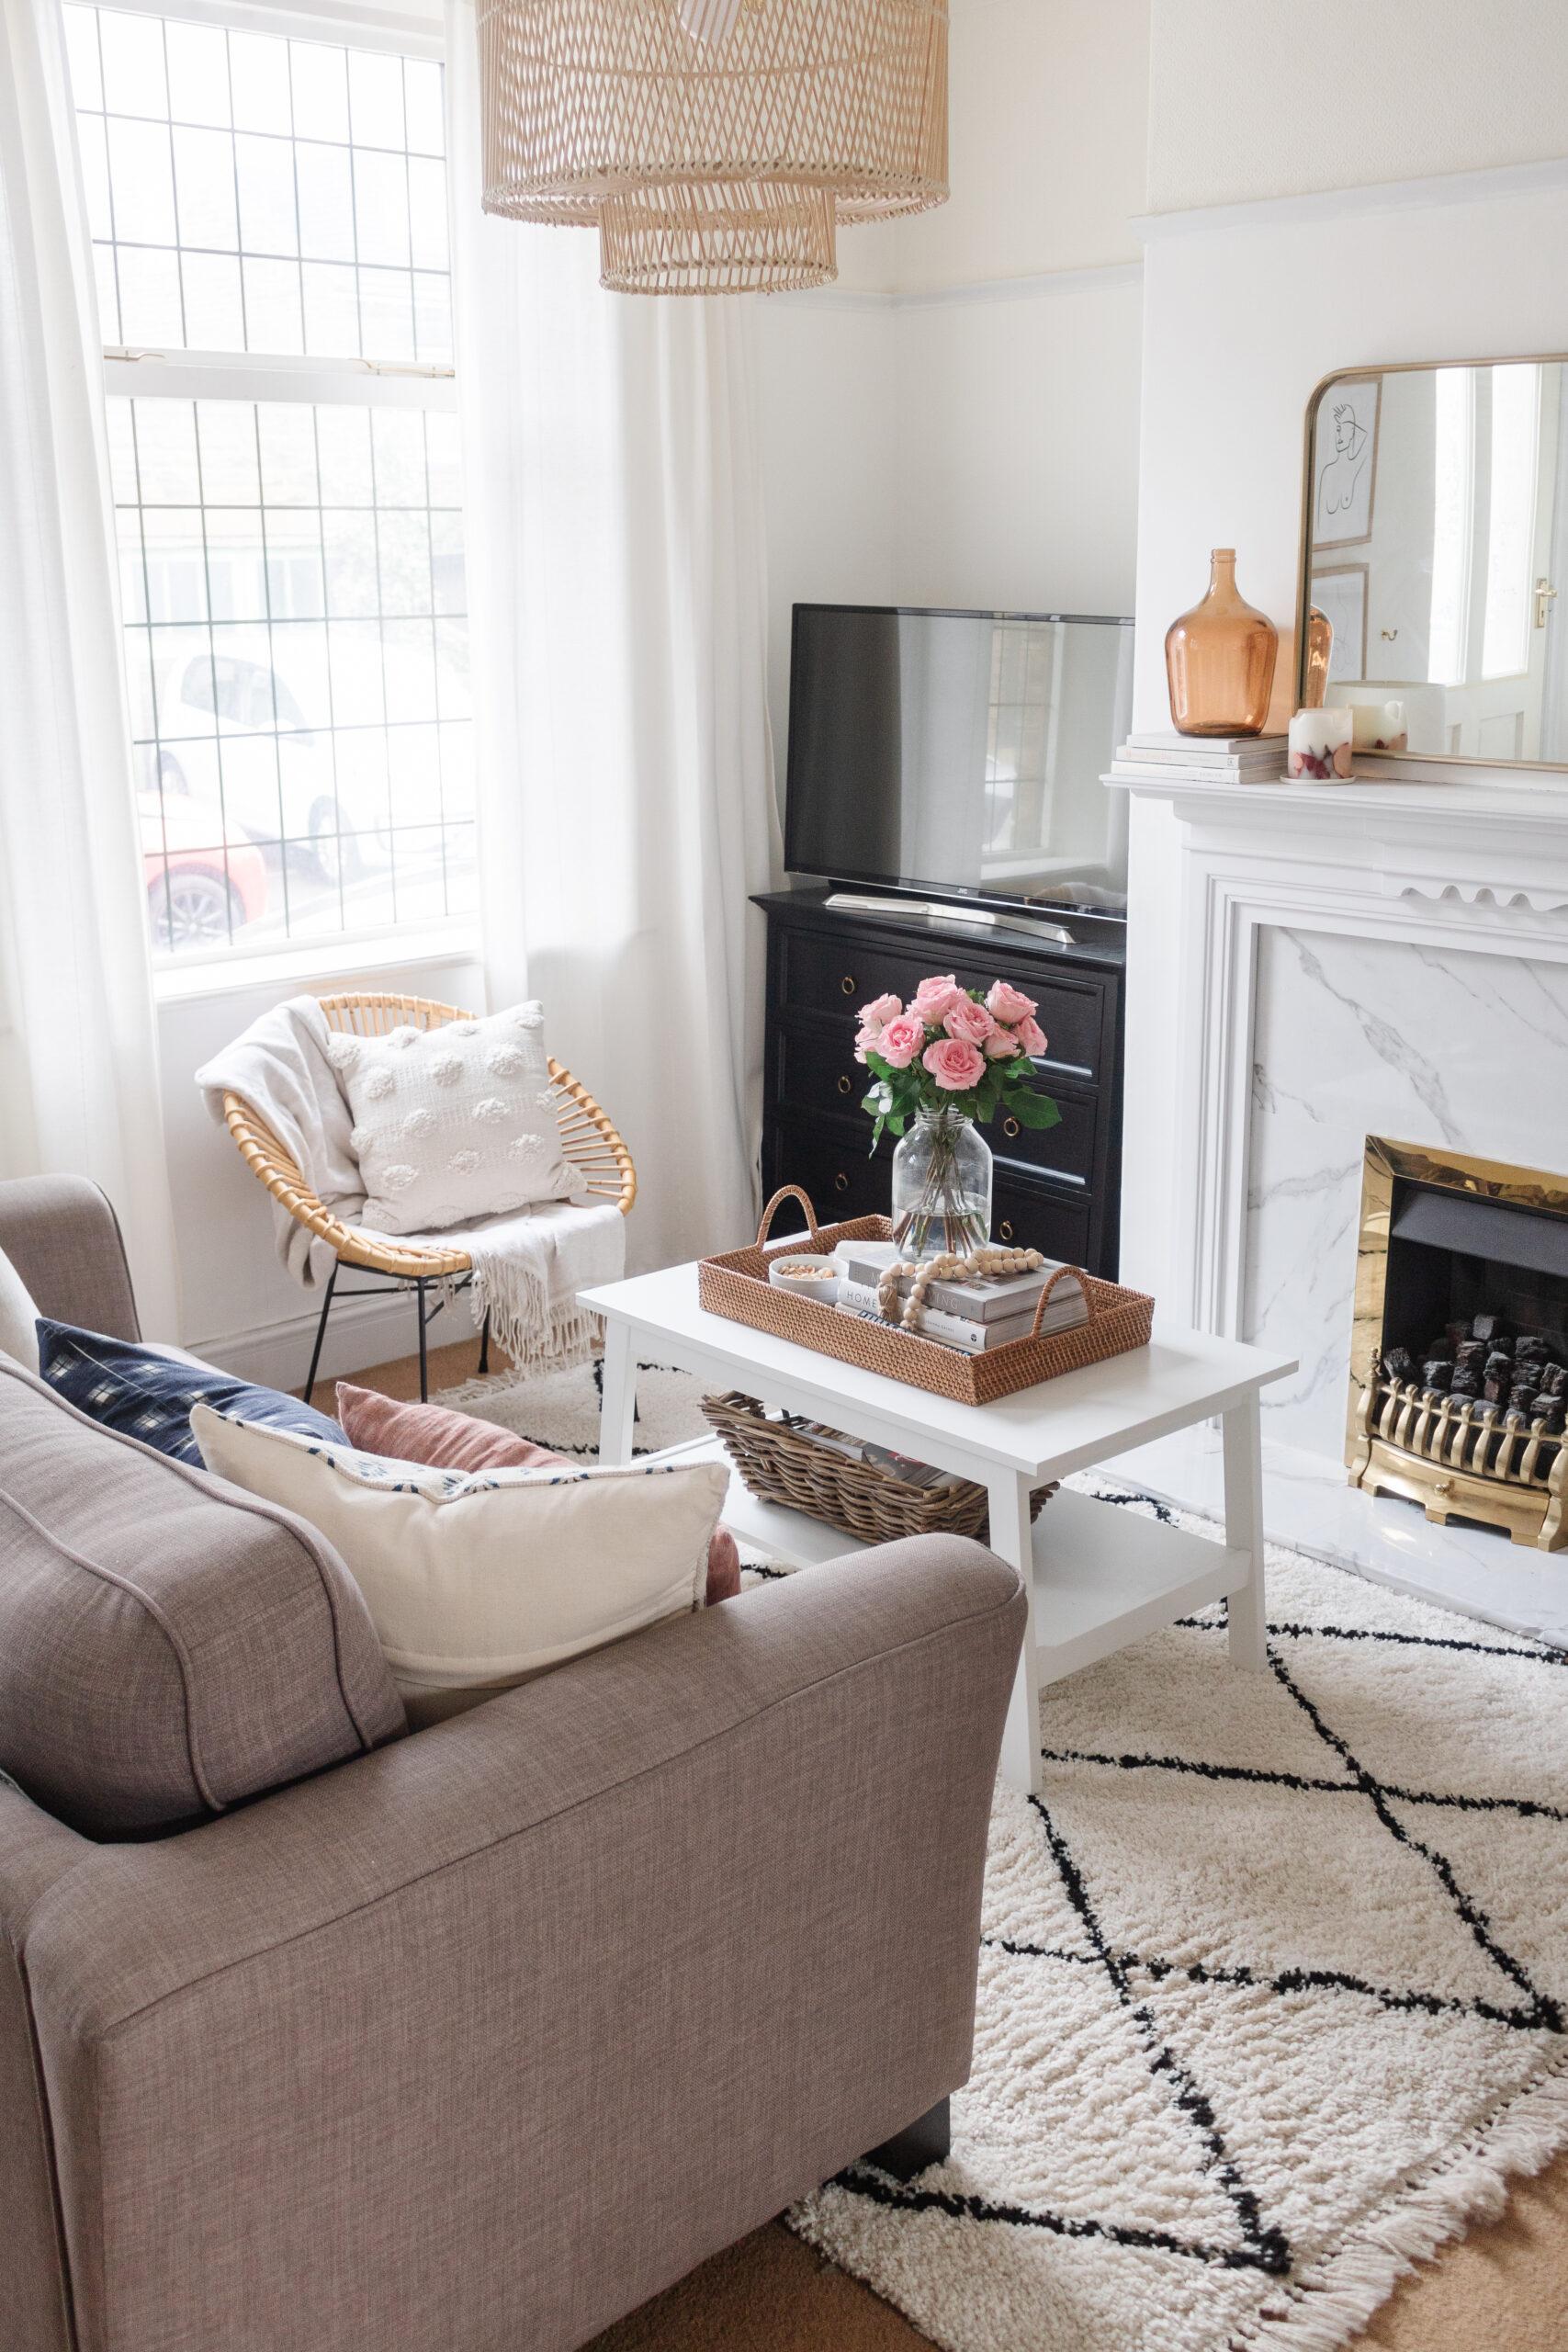 an edited lifestyle interior photos